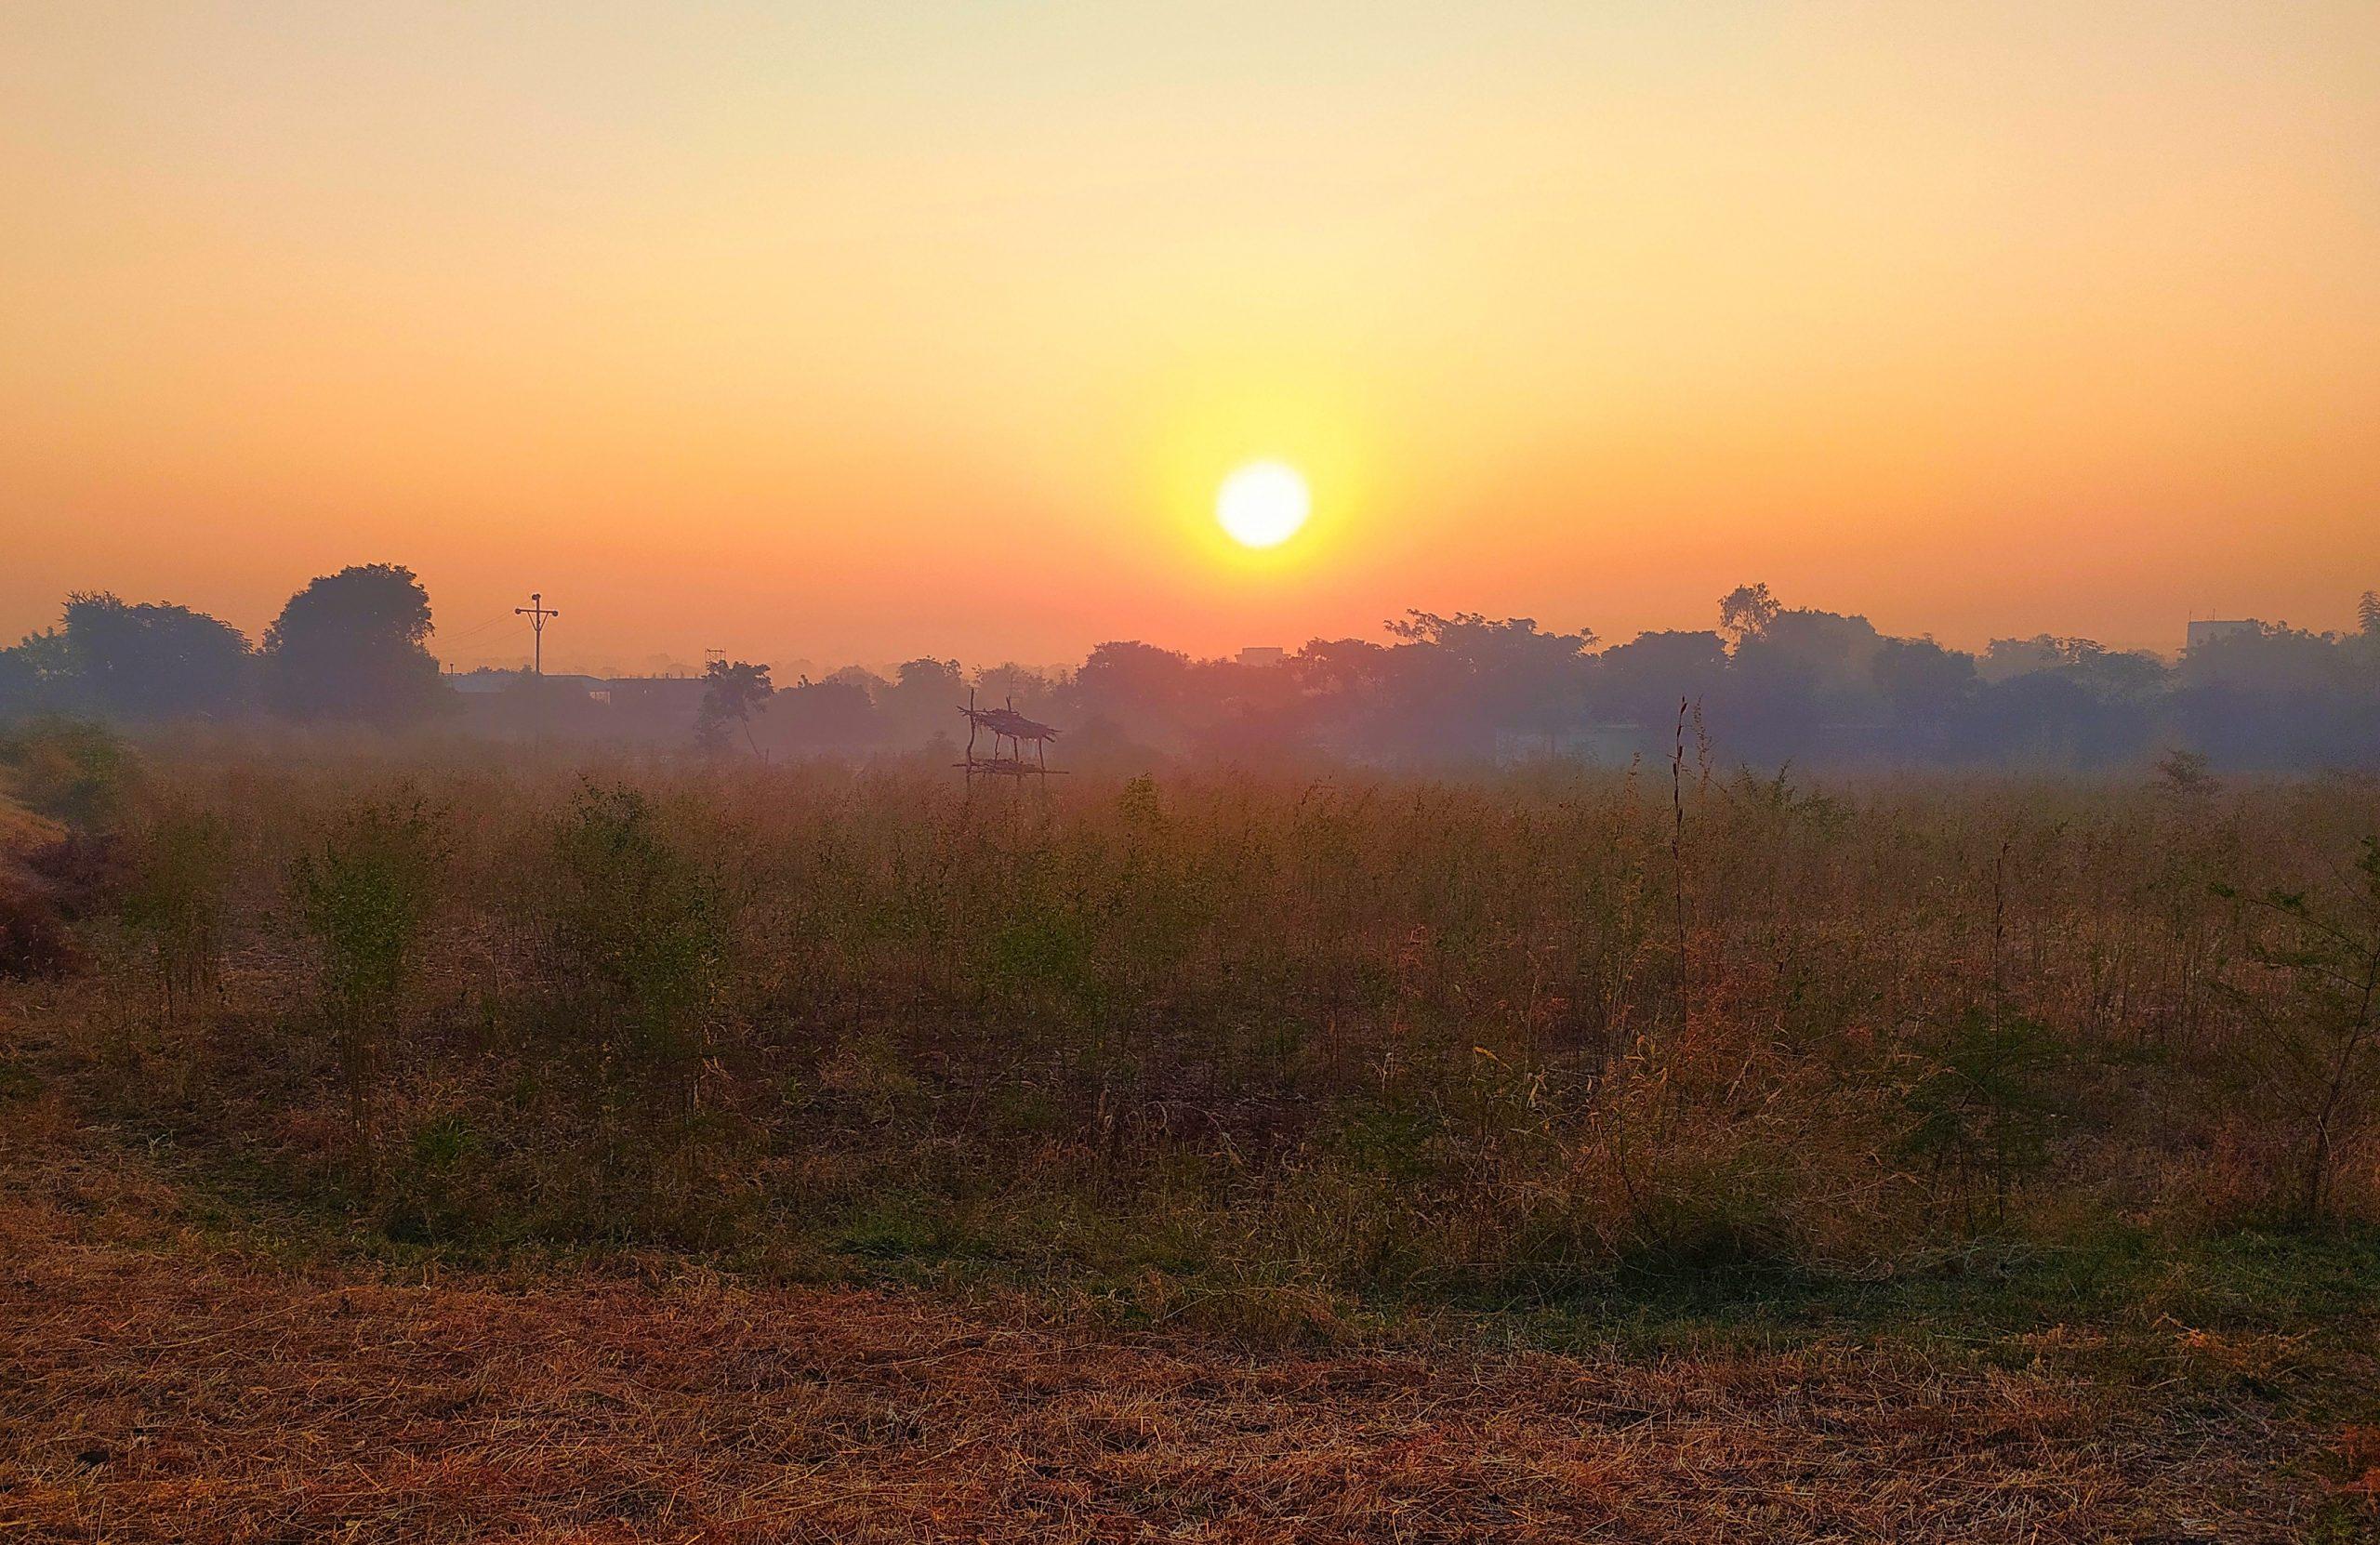 Beauty of Sunrise